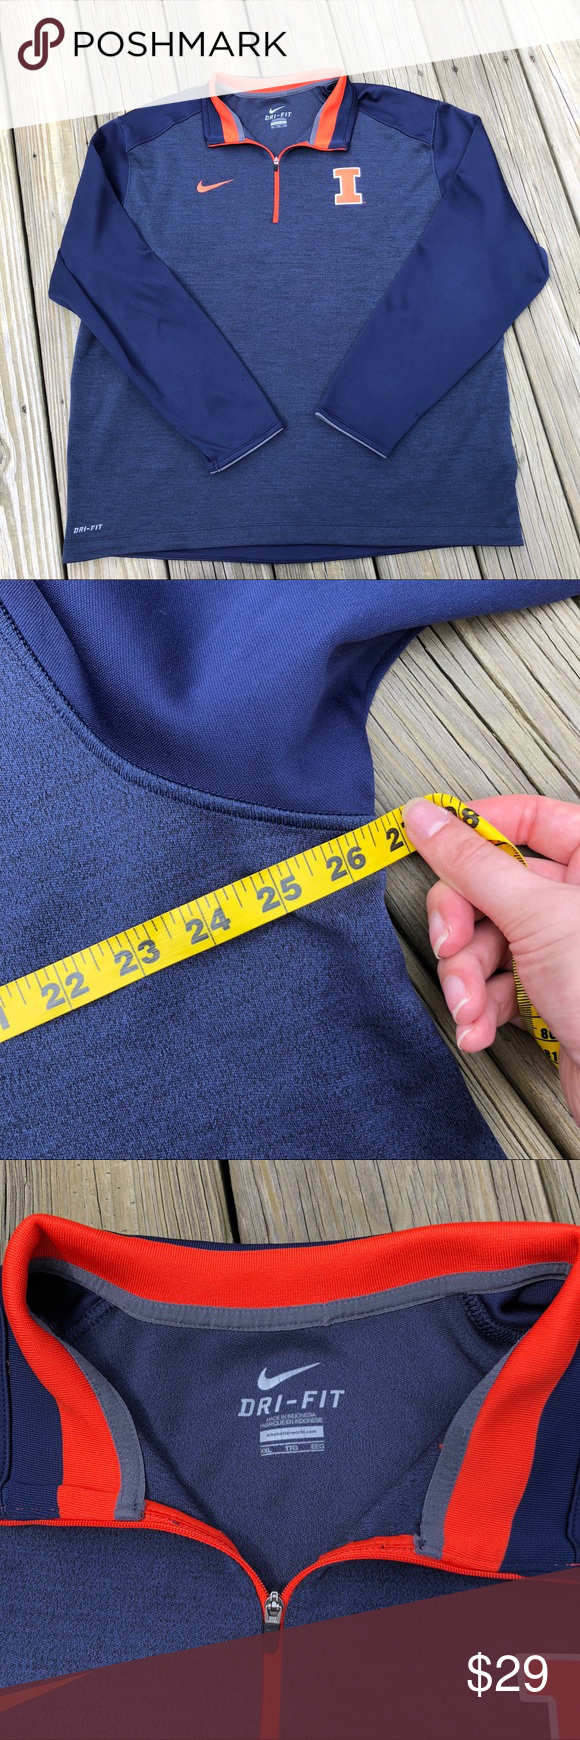 Nike University Of Illinois Sweatshirt Collarless Shirt Sweatshirt Shirt Sweatshirts [ 1740 x 580 Pixel ]